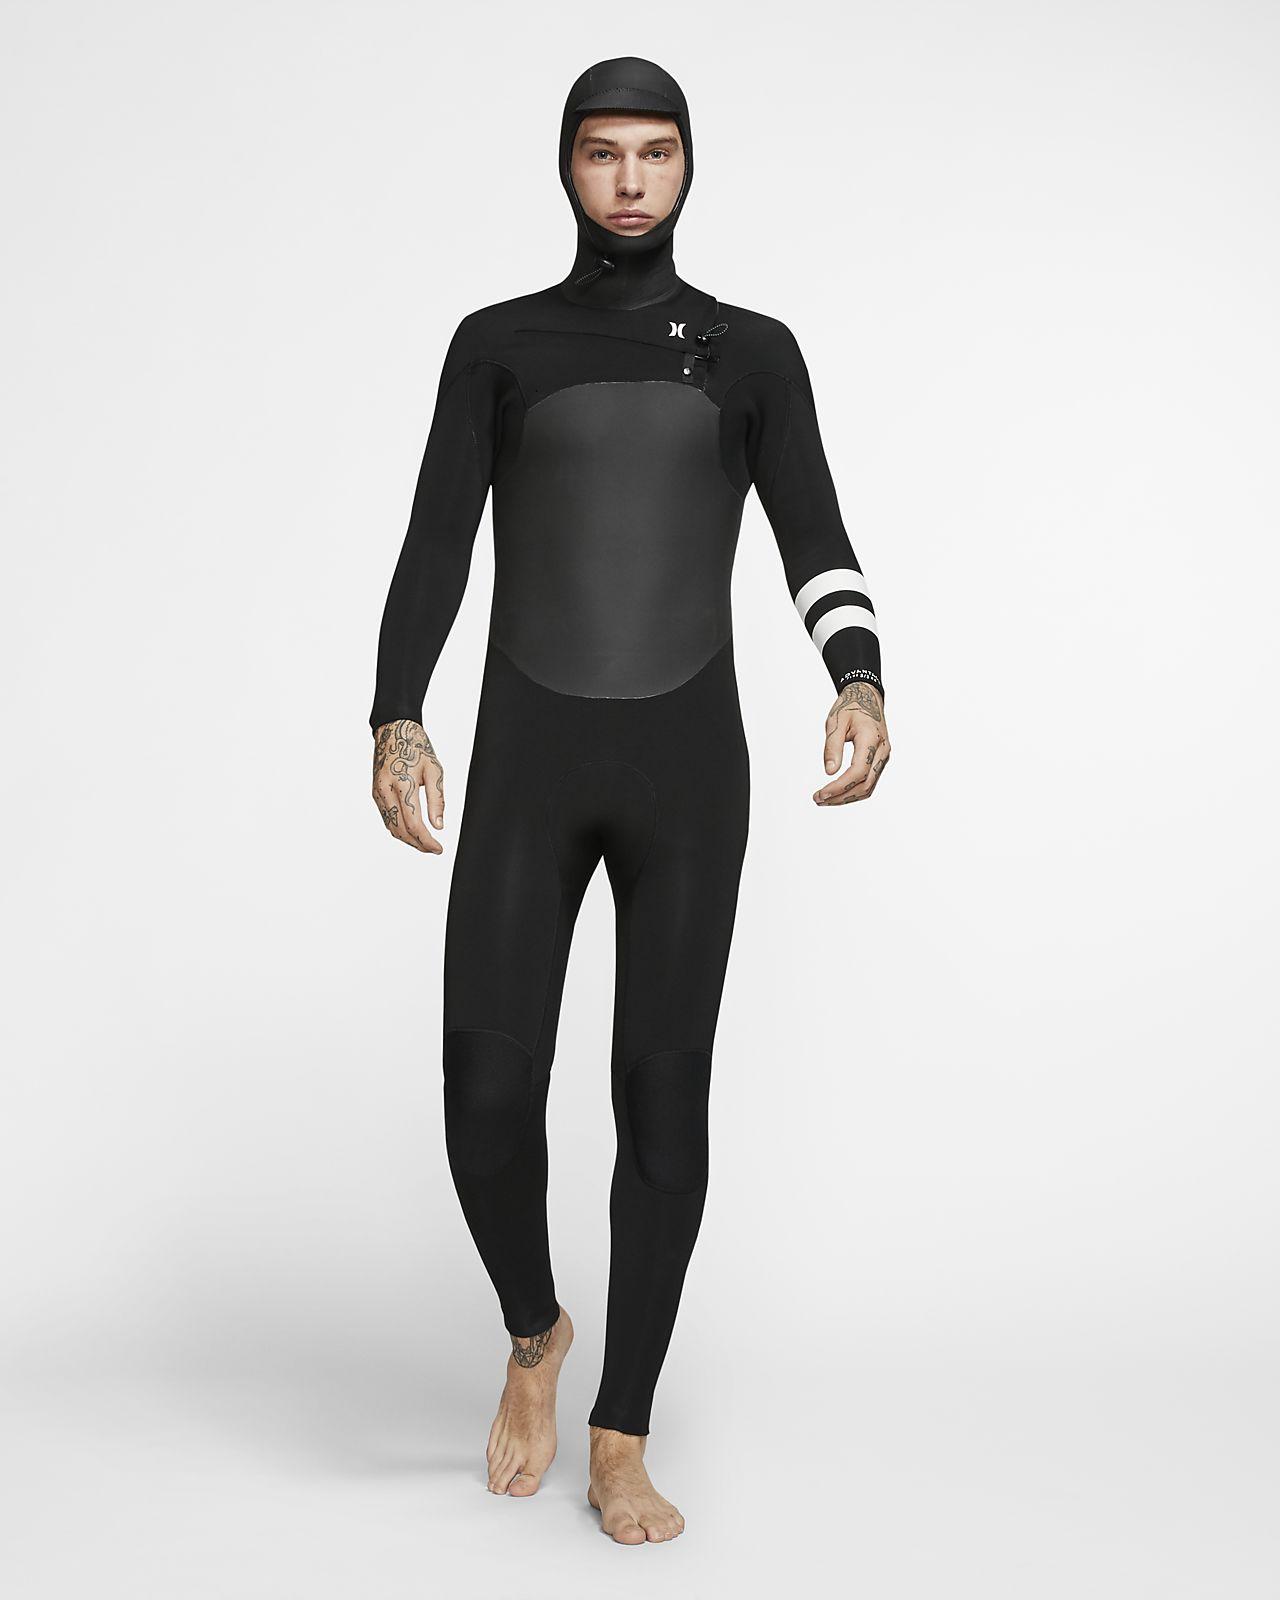 Hurley Advantage Plus 5/3mm Fullsuit Men's Hooded Wetsuit